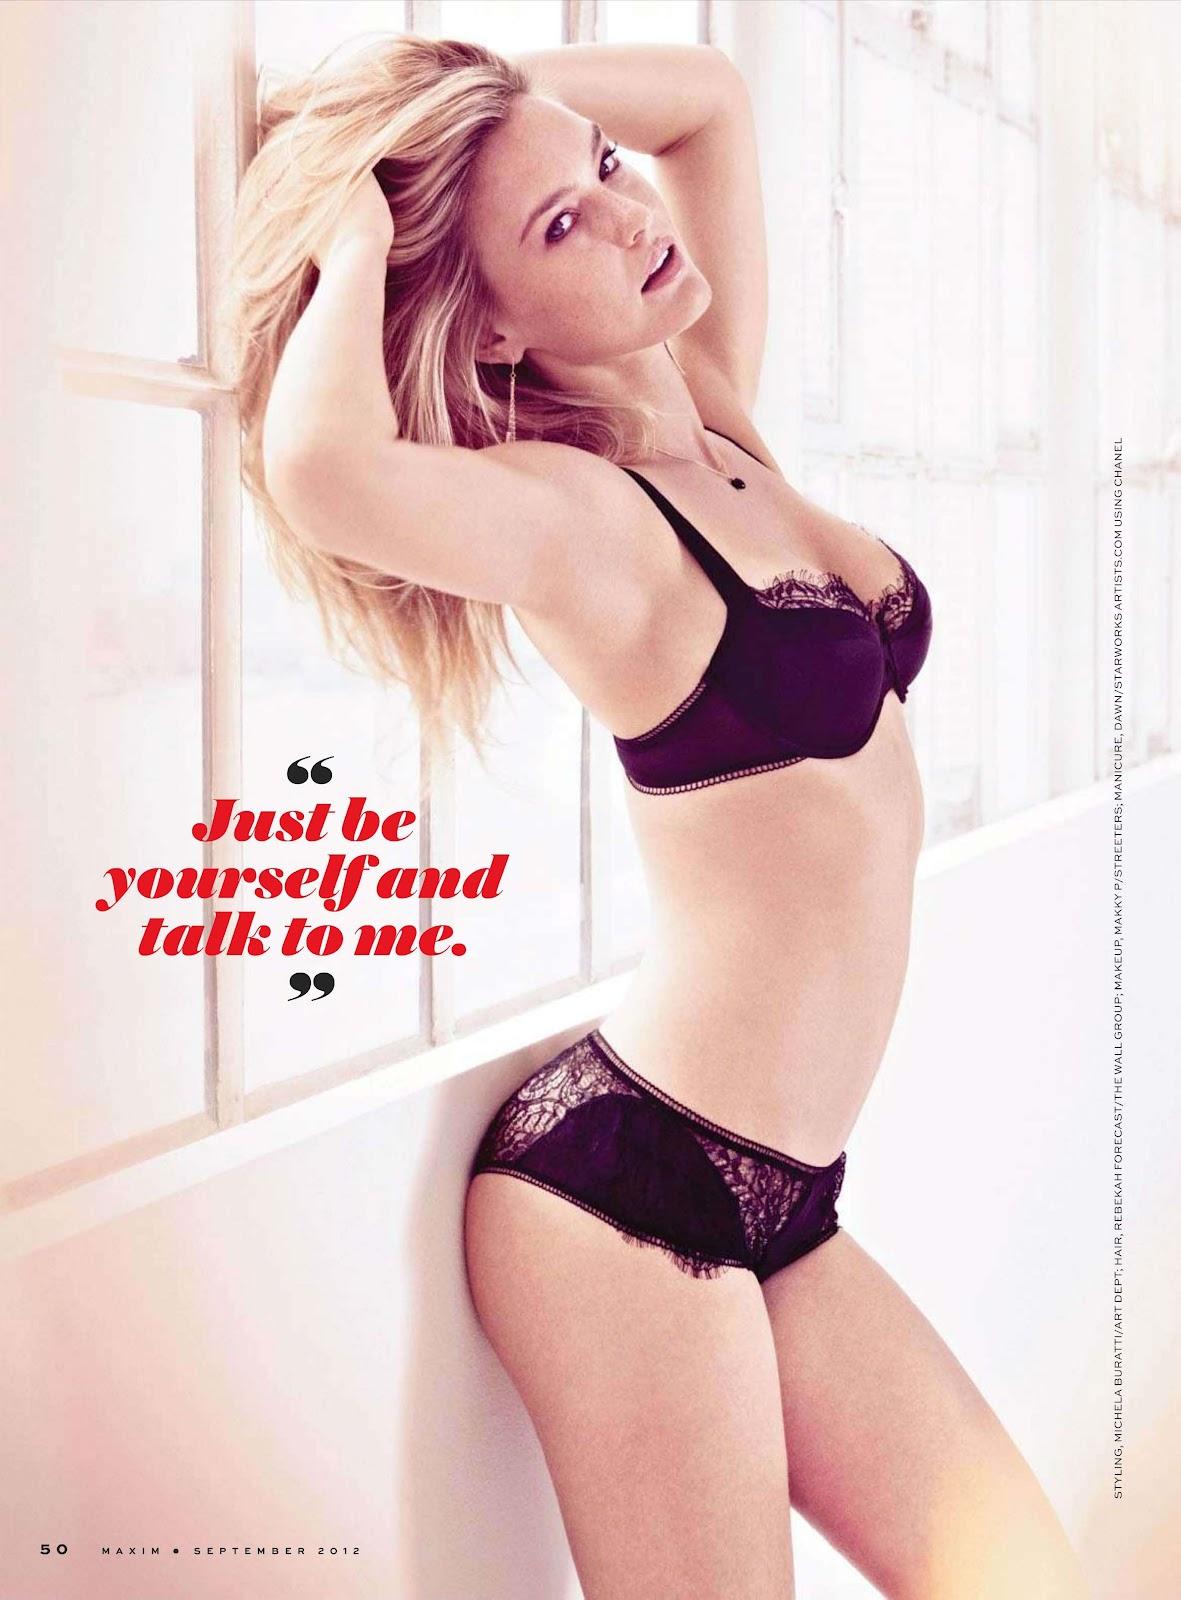 http://2.bp.blogspot.com/-fzeFsAssmPE/UCtwOW2HafI/AAAAAAAALmo/14JqTjzZVc0/s1600/Bar+Refaeli-+Bikini+Babe+in+Maxim+magazine+September+2012+issue-07.jpg